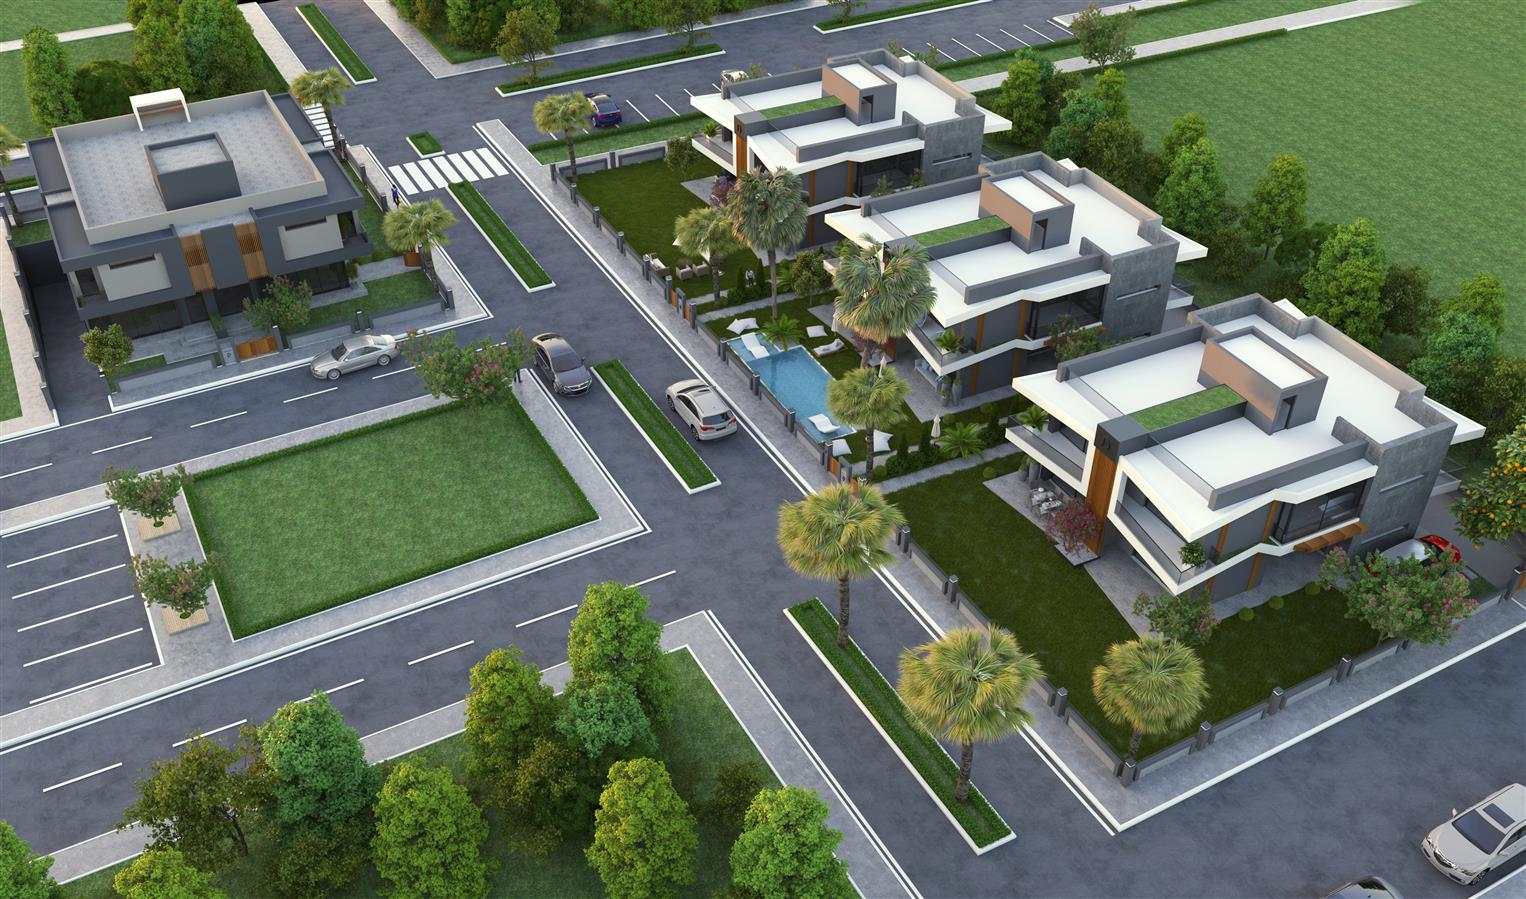 demren-park201716175522487.jpg Demren İnşaat Proje